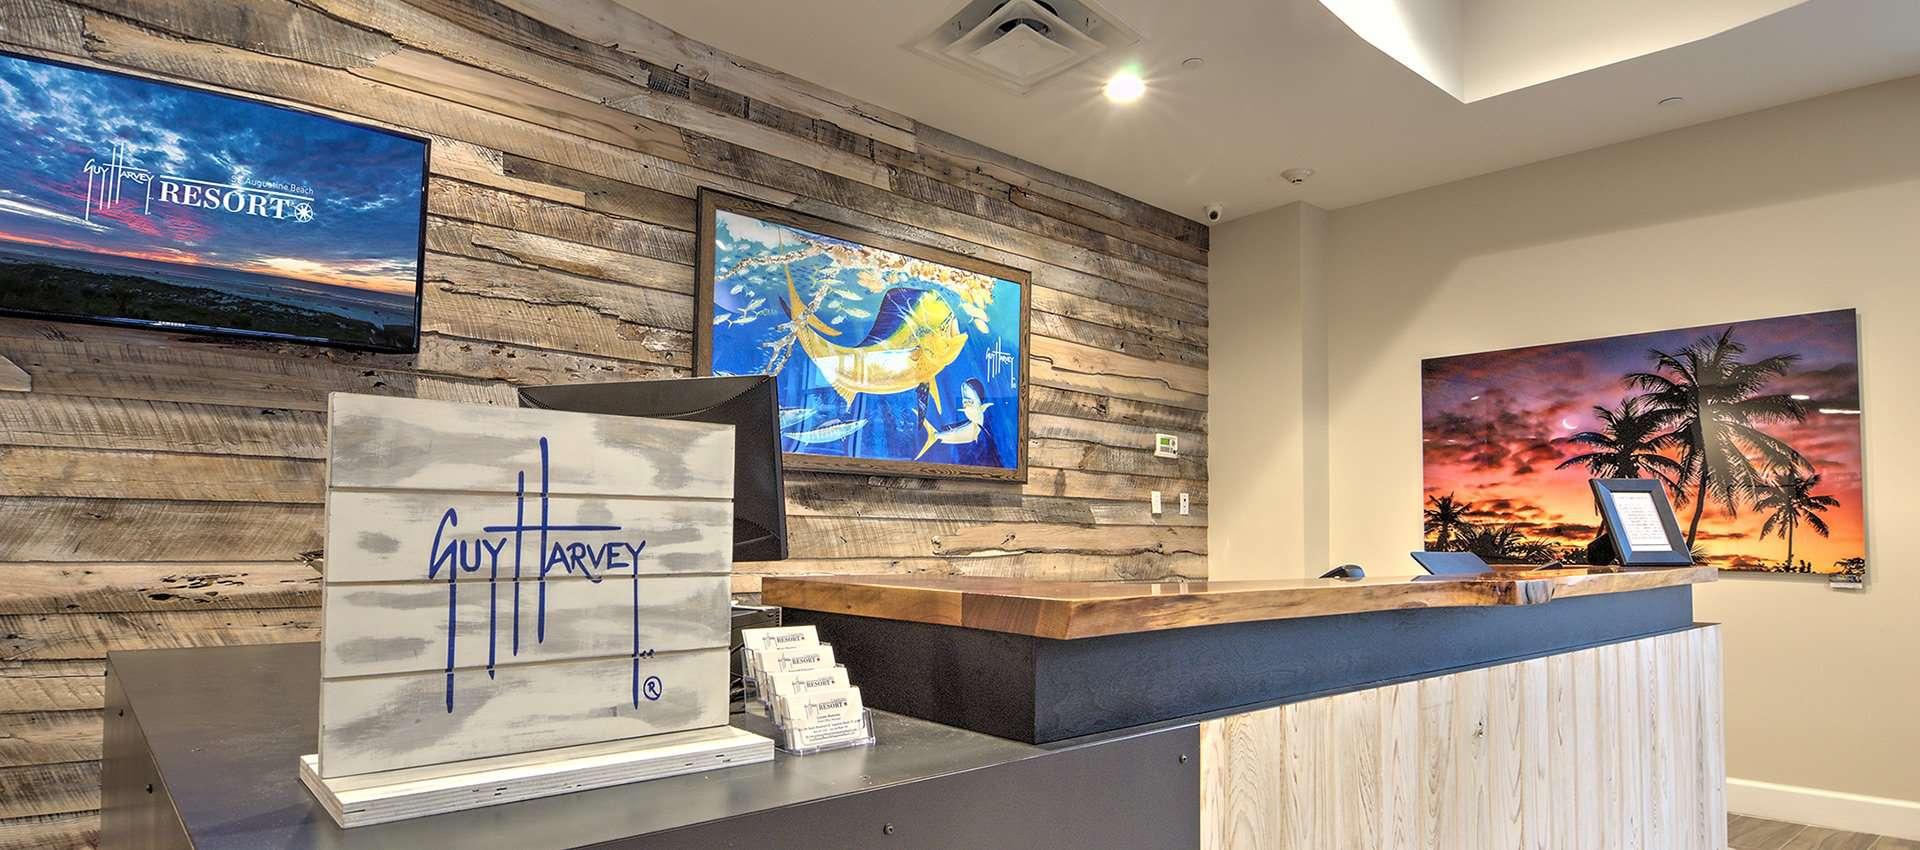 Guy Harvey Resort St. Augustine Beach